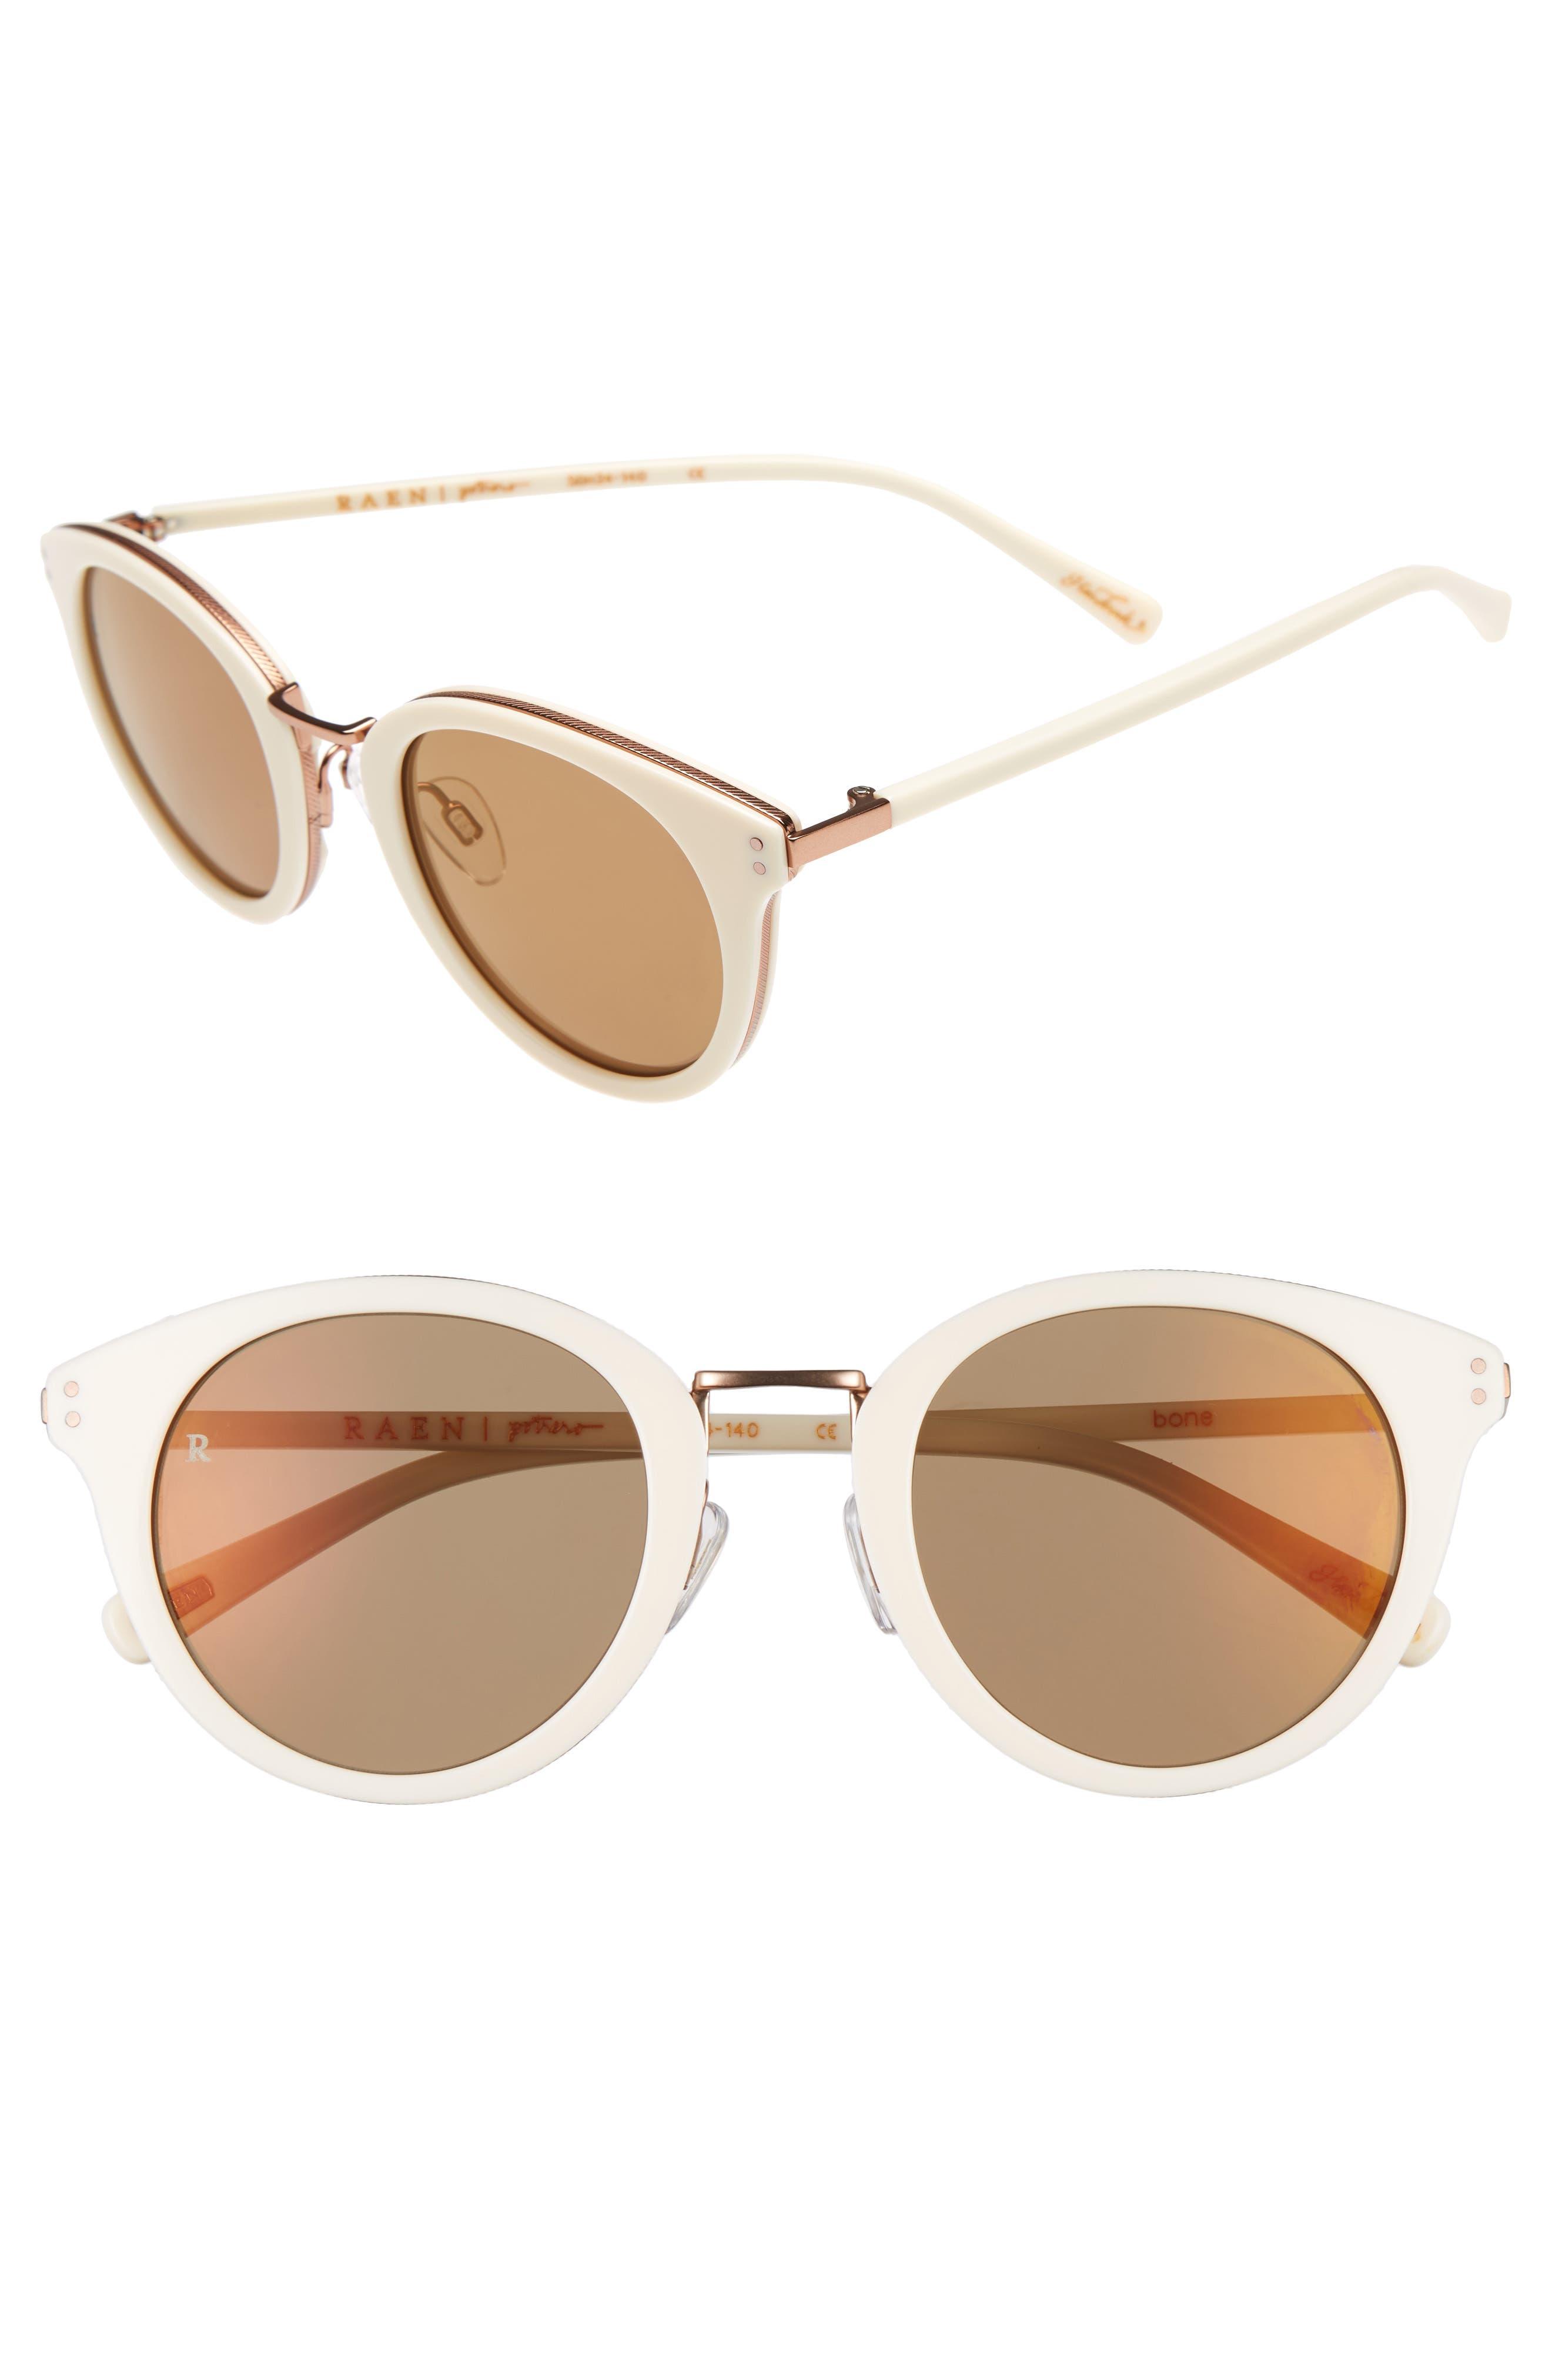 Portrero 50mm Sunglasses,                             Main thumbnail 1, color,                             Bone